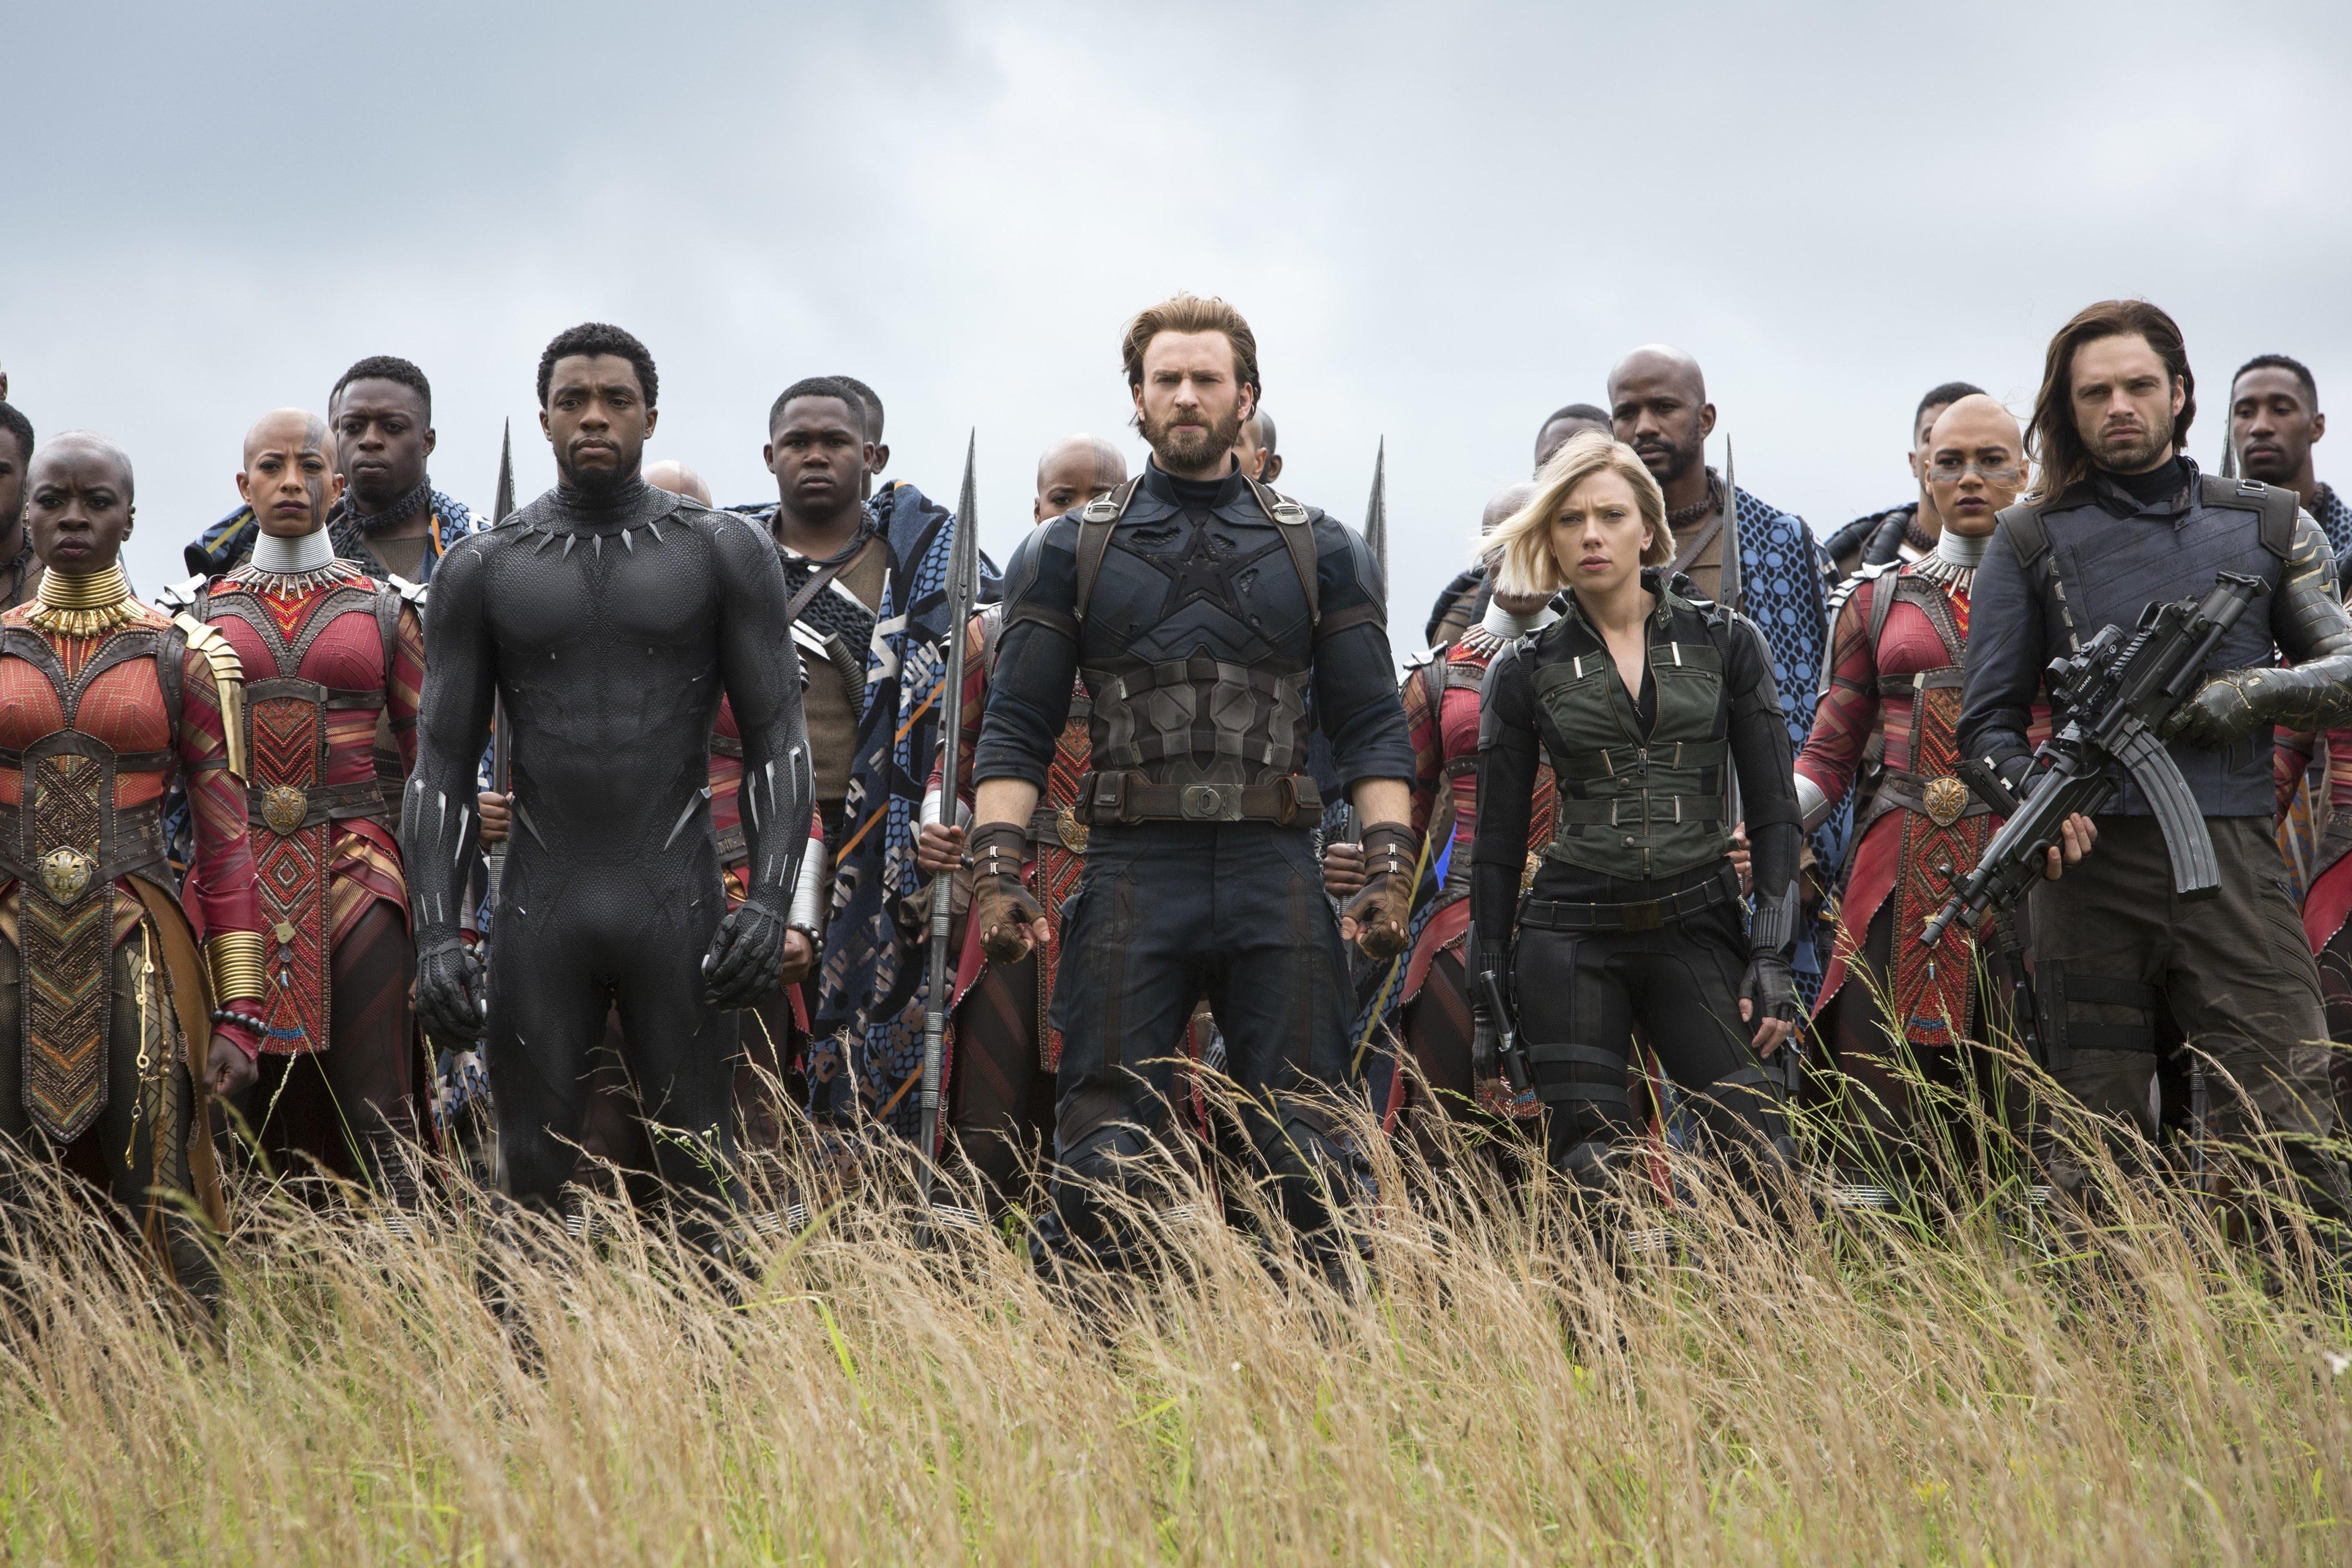 Captain America and Black Panther to outrun Wakandan warriors in Infinity War :「アベンジャーズ : インフィニティ・ウォー」のクライマックスのワカンダ決戦のシーンで、キャプテン・アメリカとブラック・パンサーが猛烈なスピードで走ることができた理由 ! !